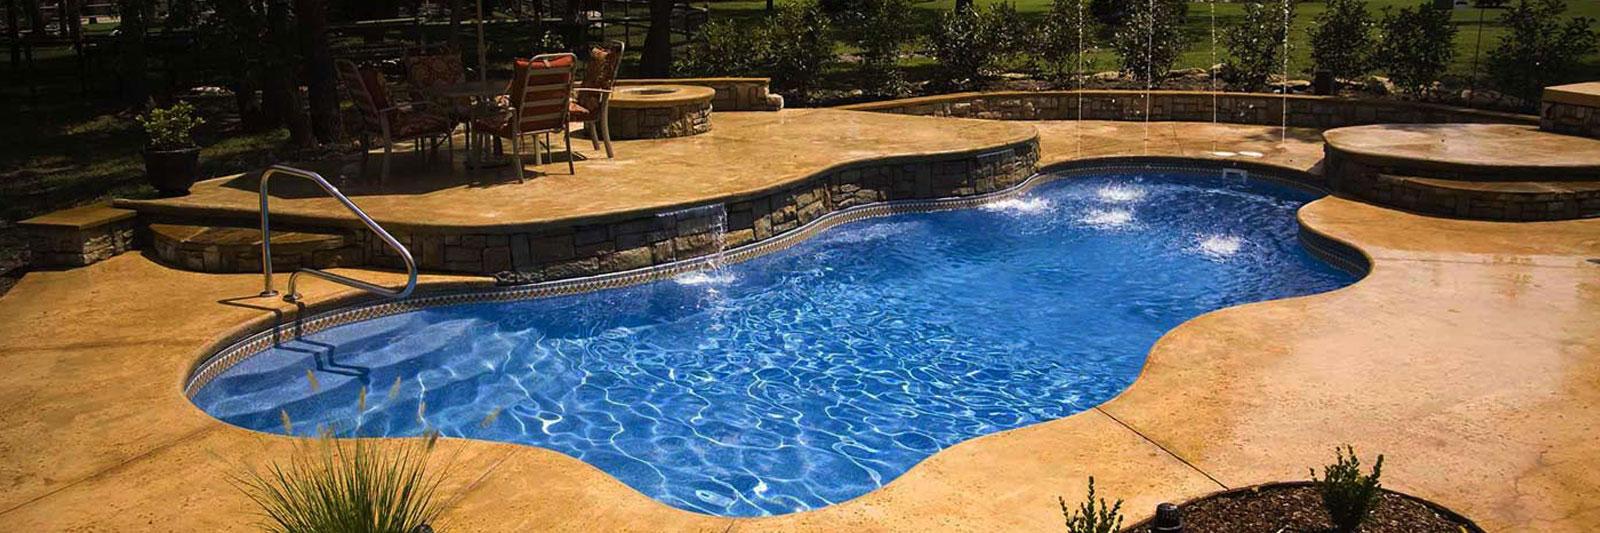 Viking Fiberglass Pools - Aqua Pro Pool & Spa